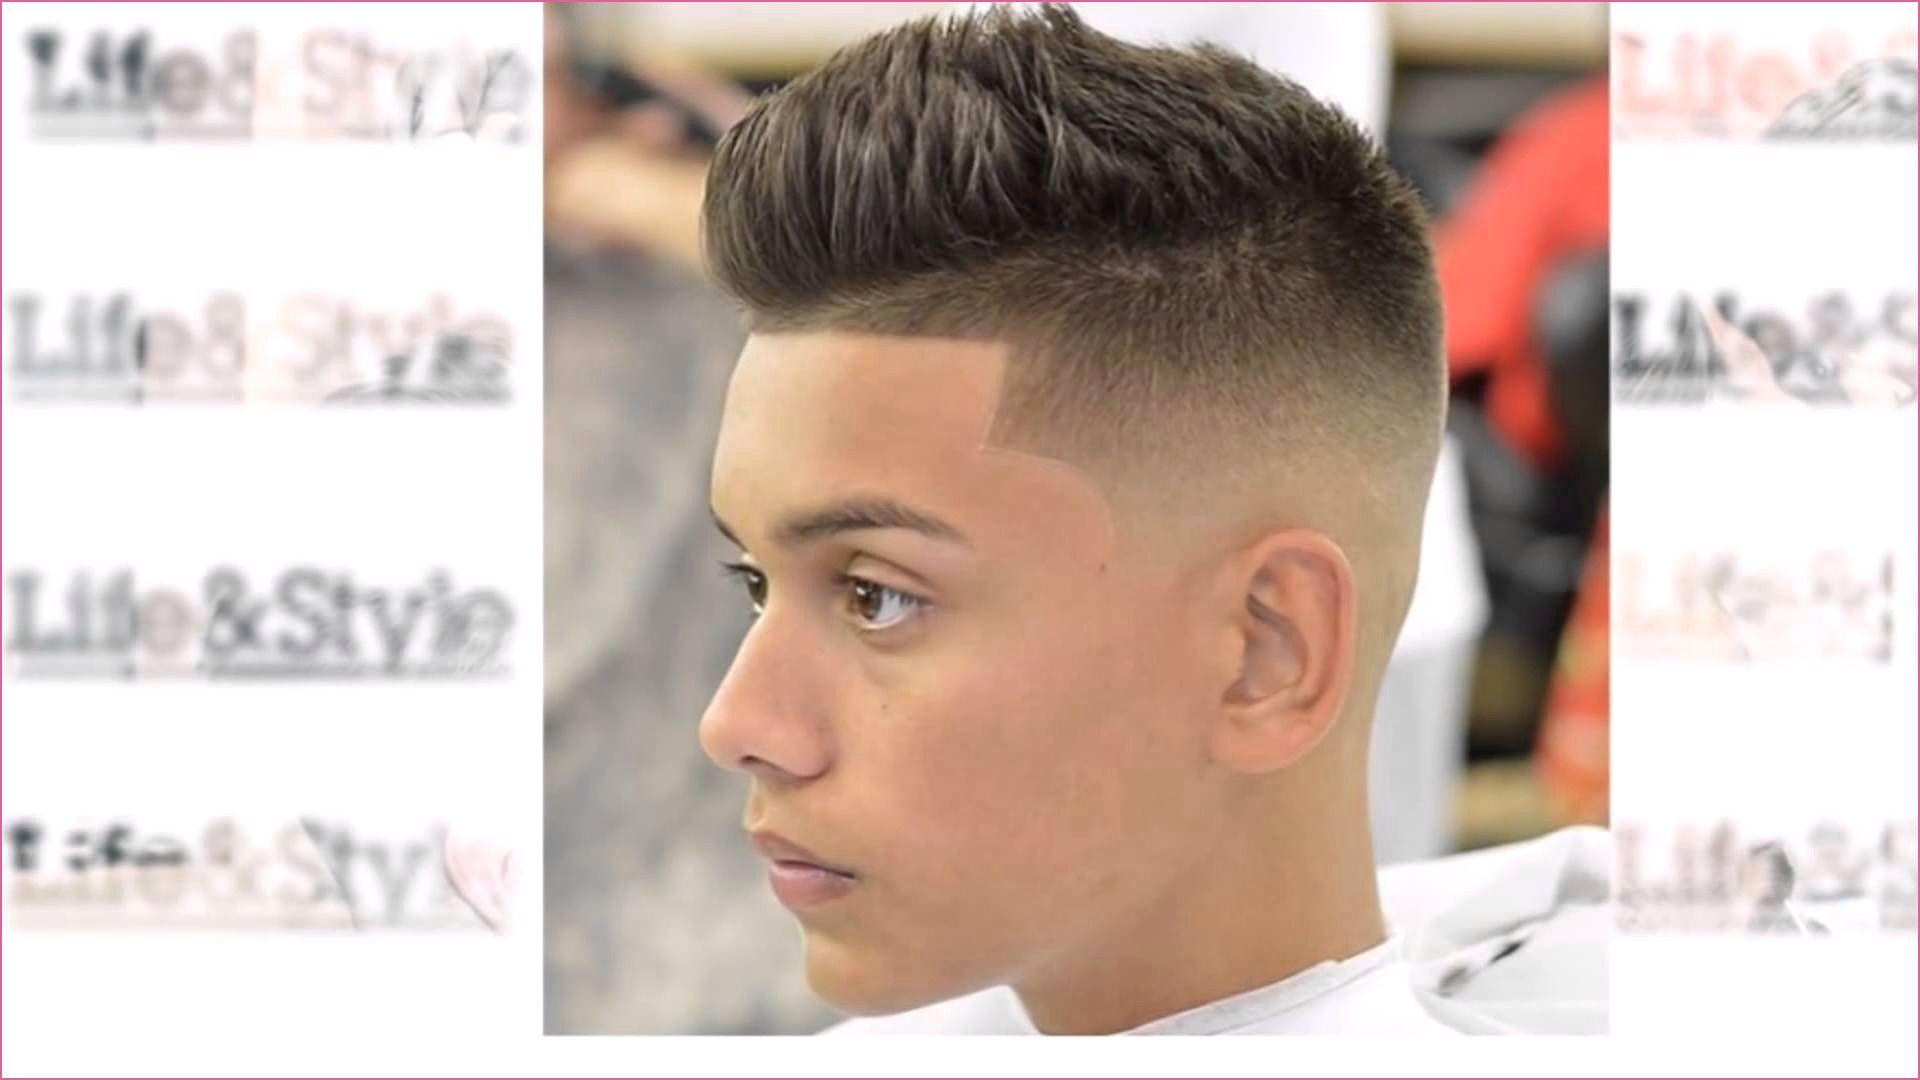 Herren Frisuren Punk Coole Frisuren Männer Kurz  Mens hairstyles